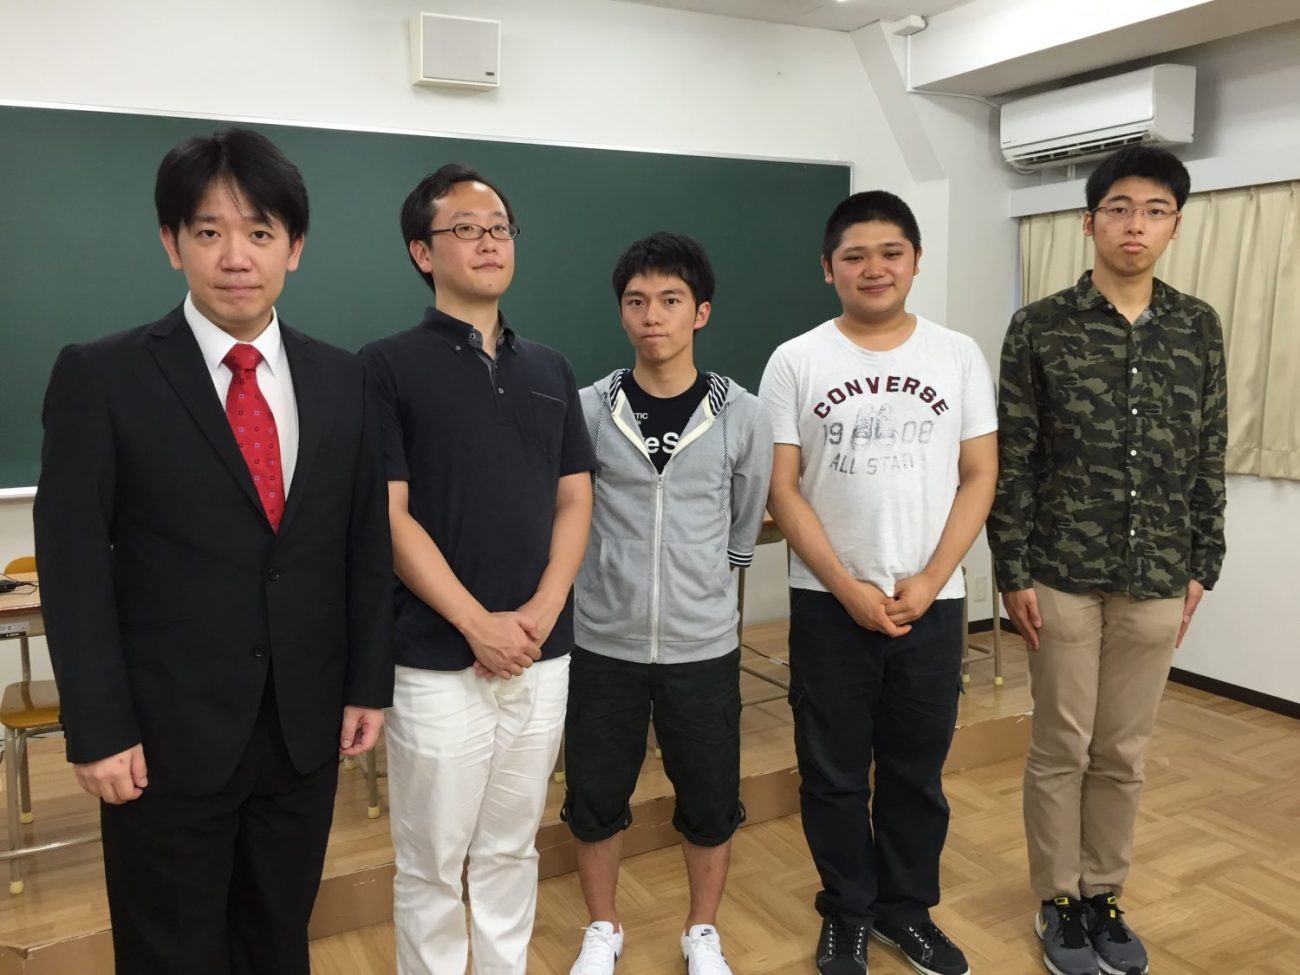 QUIZ JAPAN TVのオリジナルクイズ番組「魁!!クイズ塾」第19回は「大学生大会」!